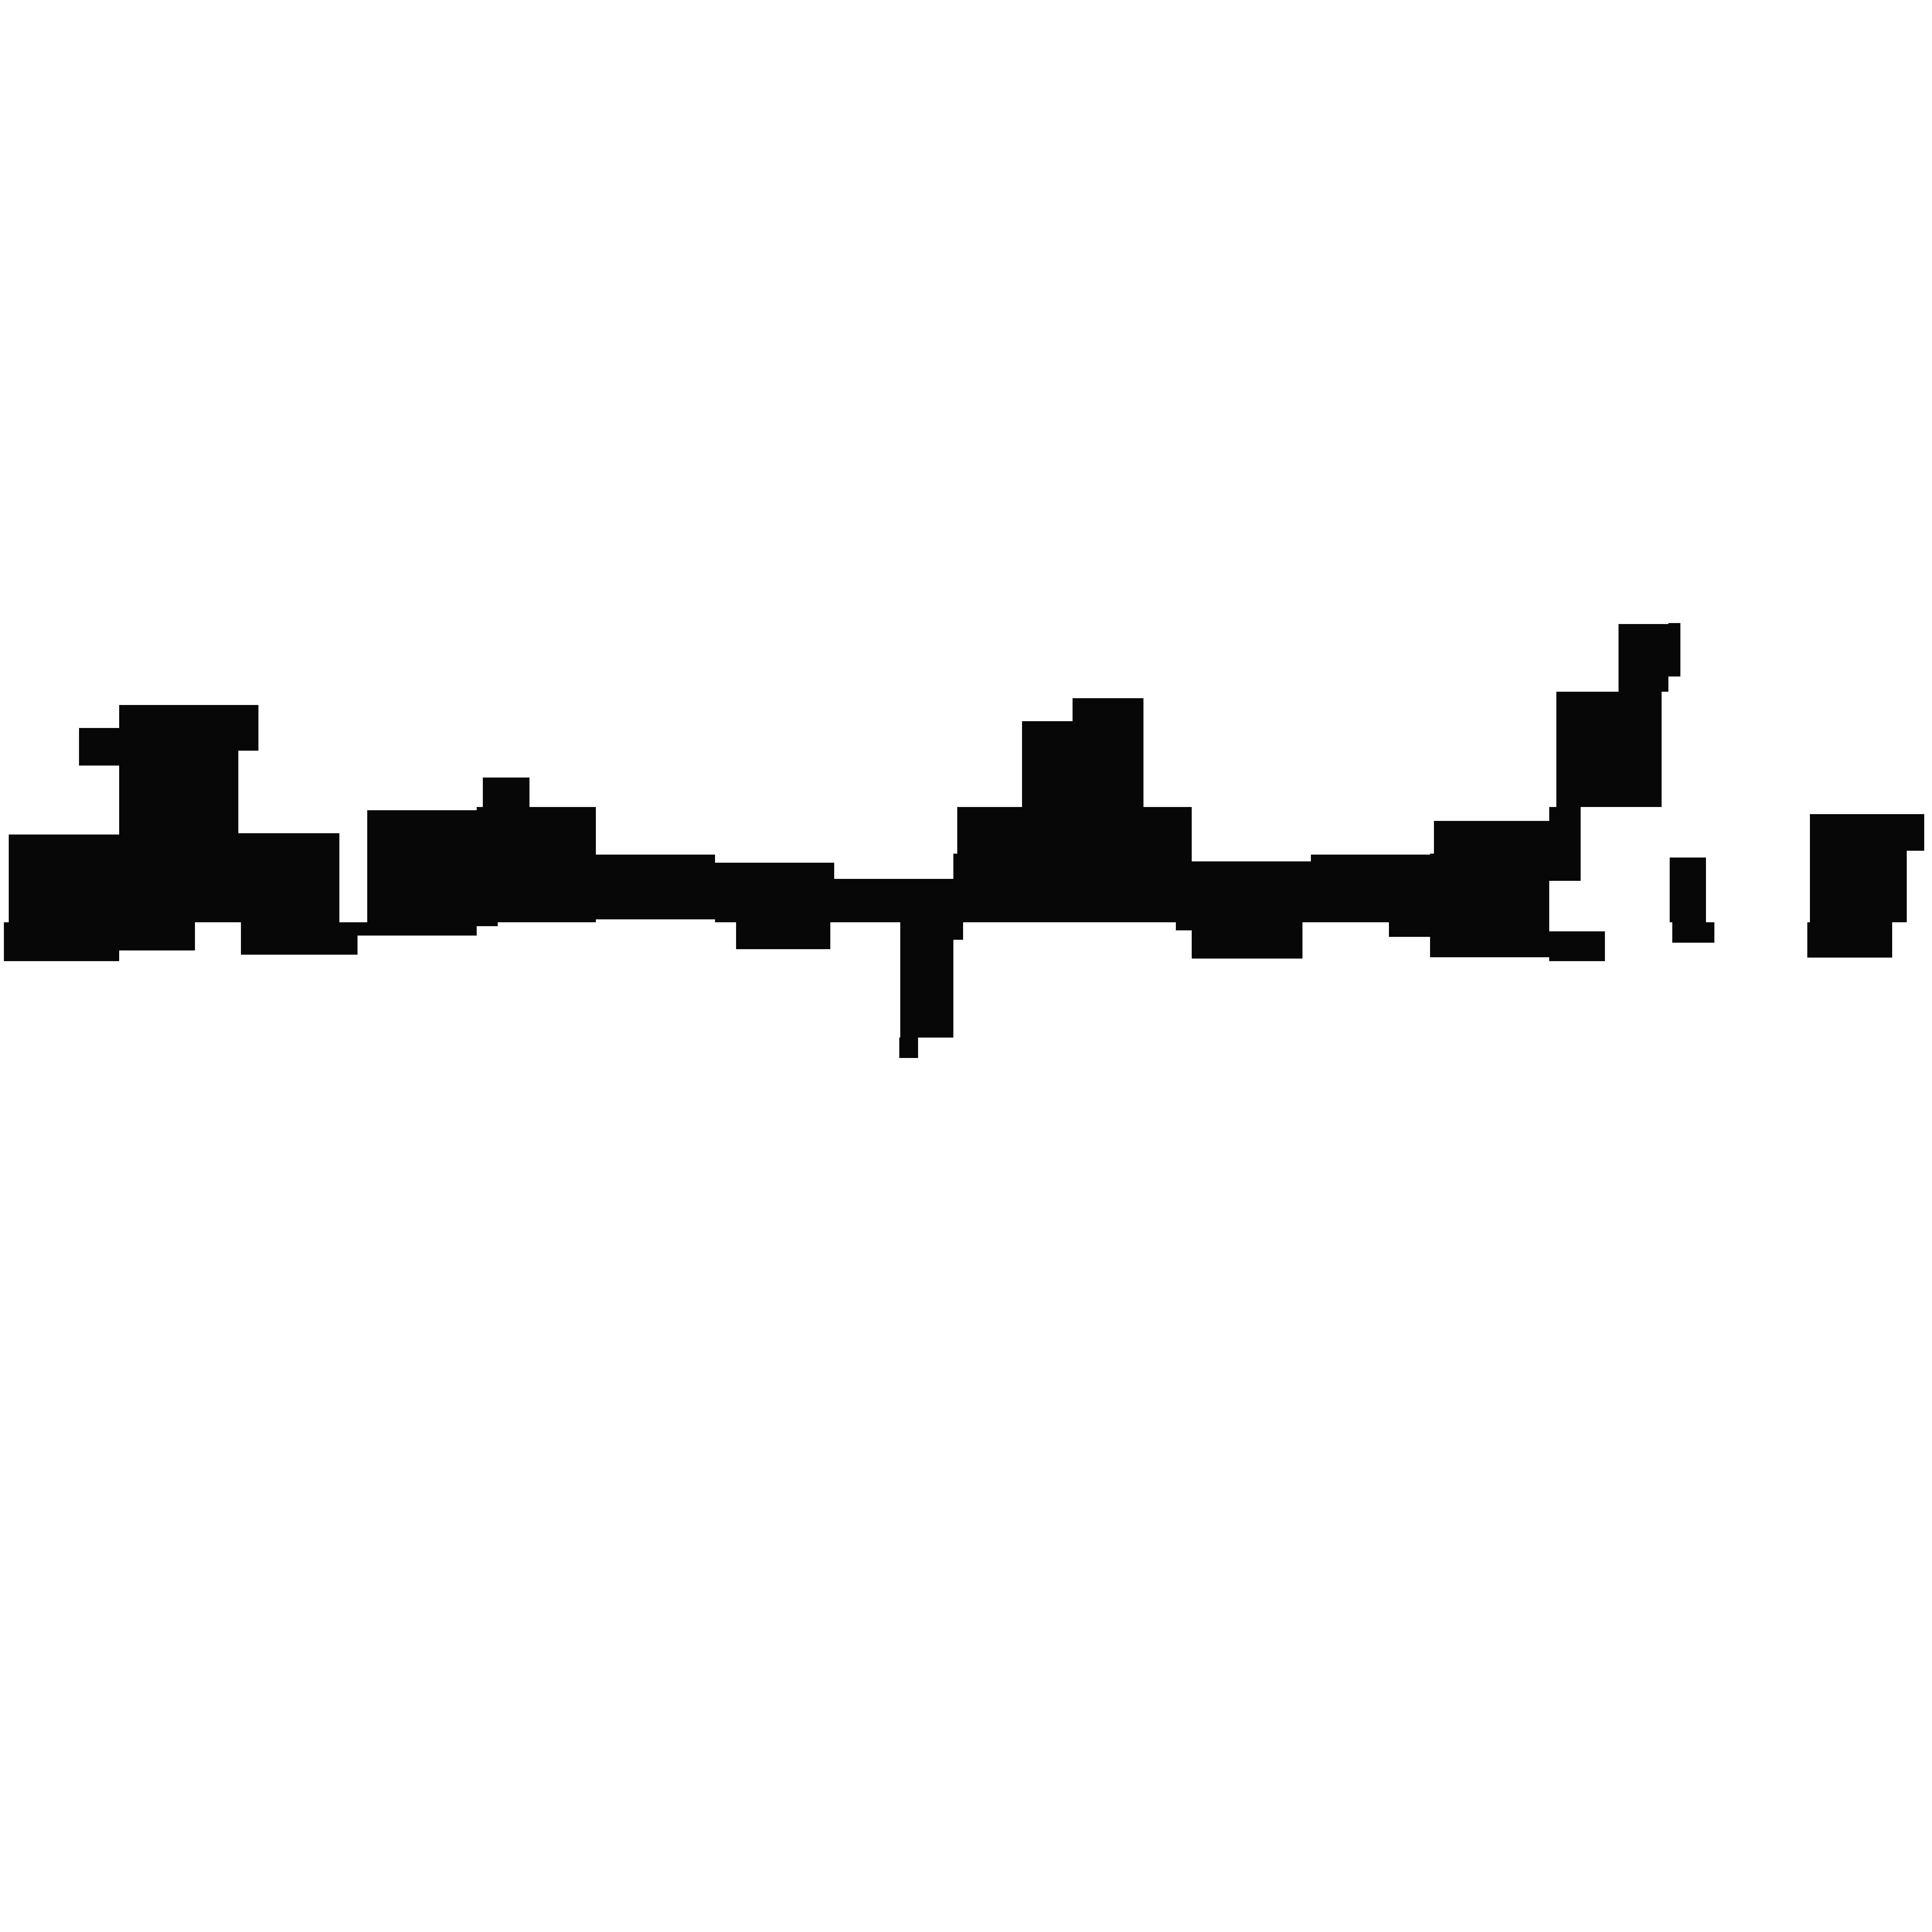 zelko radic Signature